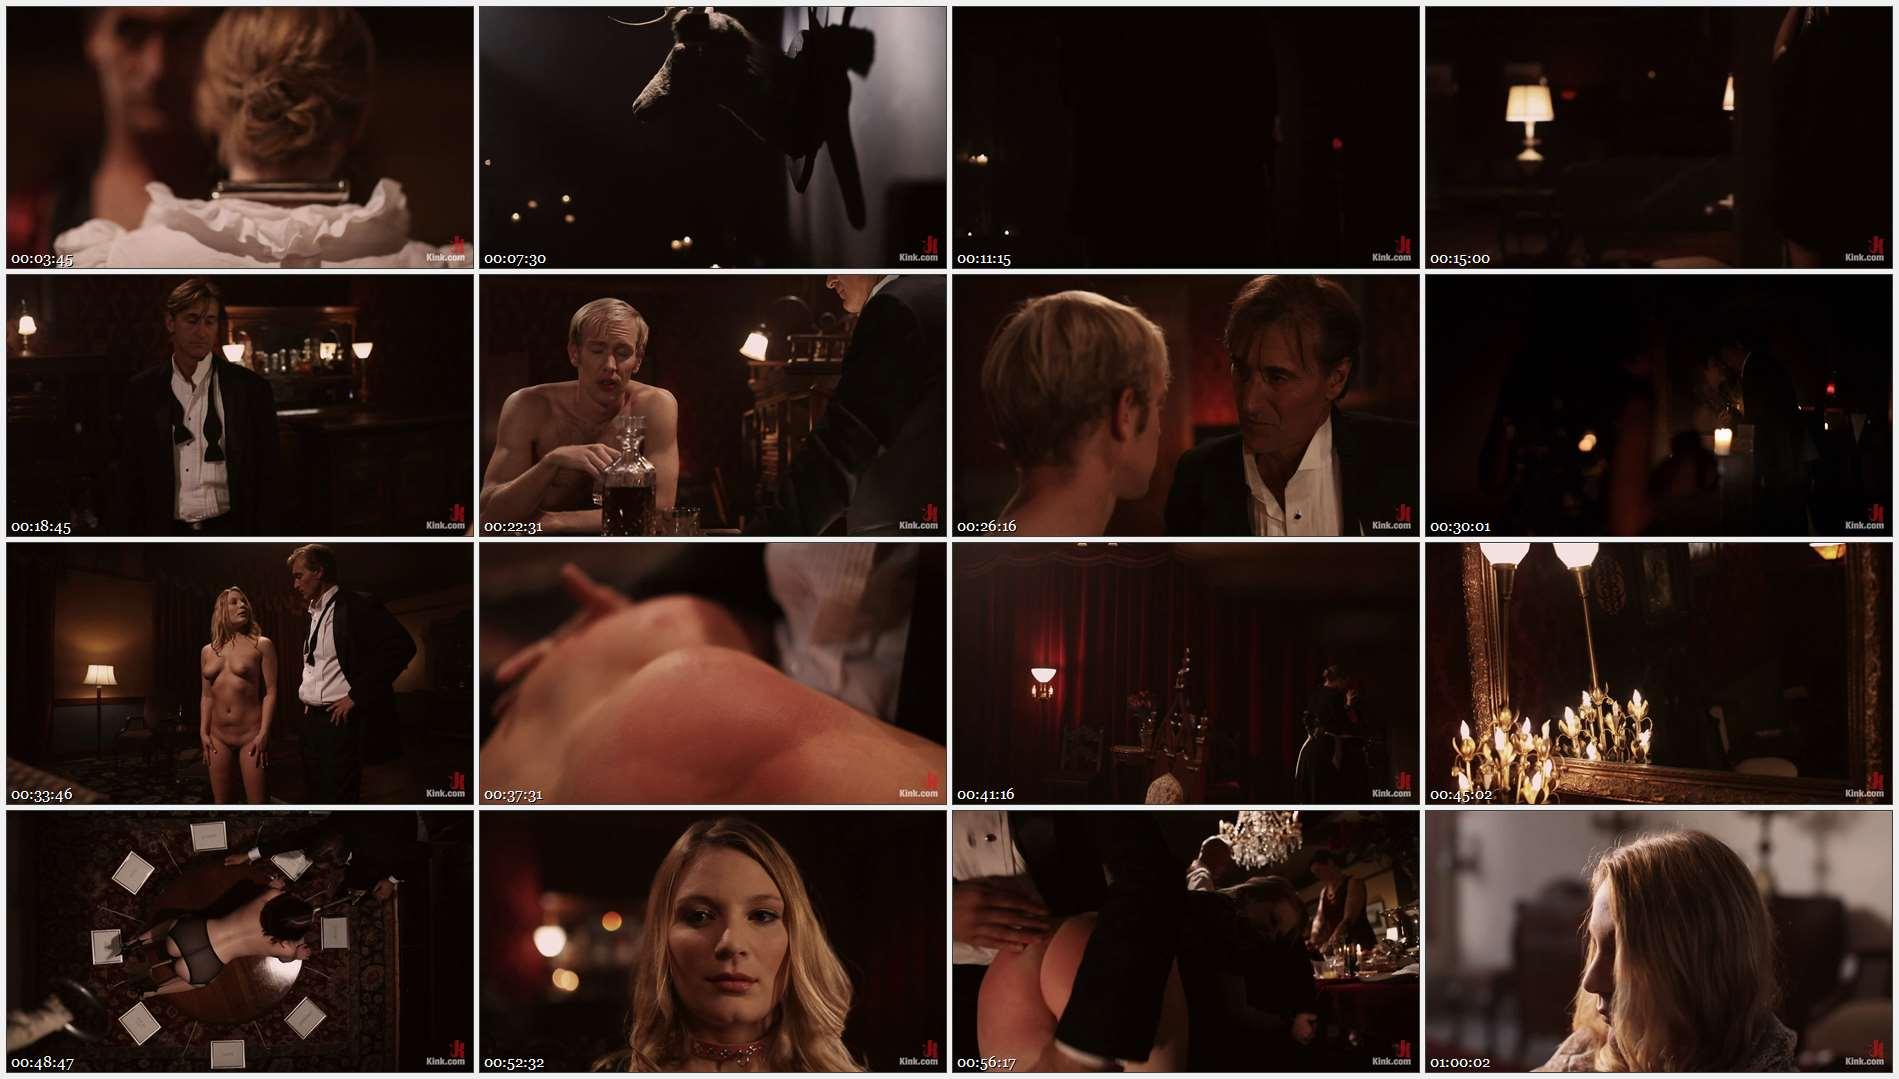 Lilla Katt – Madison Young – Aurora Snow – Ned Mayhem – Indietro: The Director's Cut